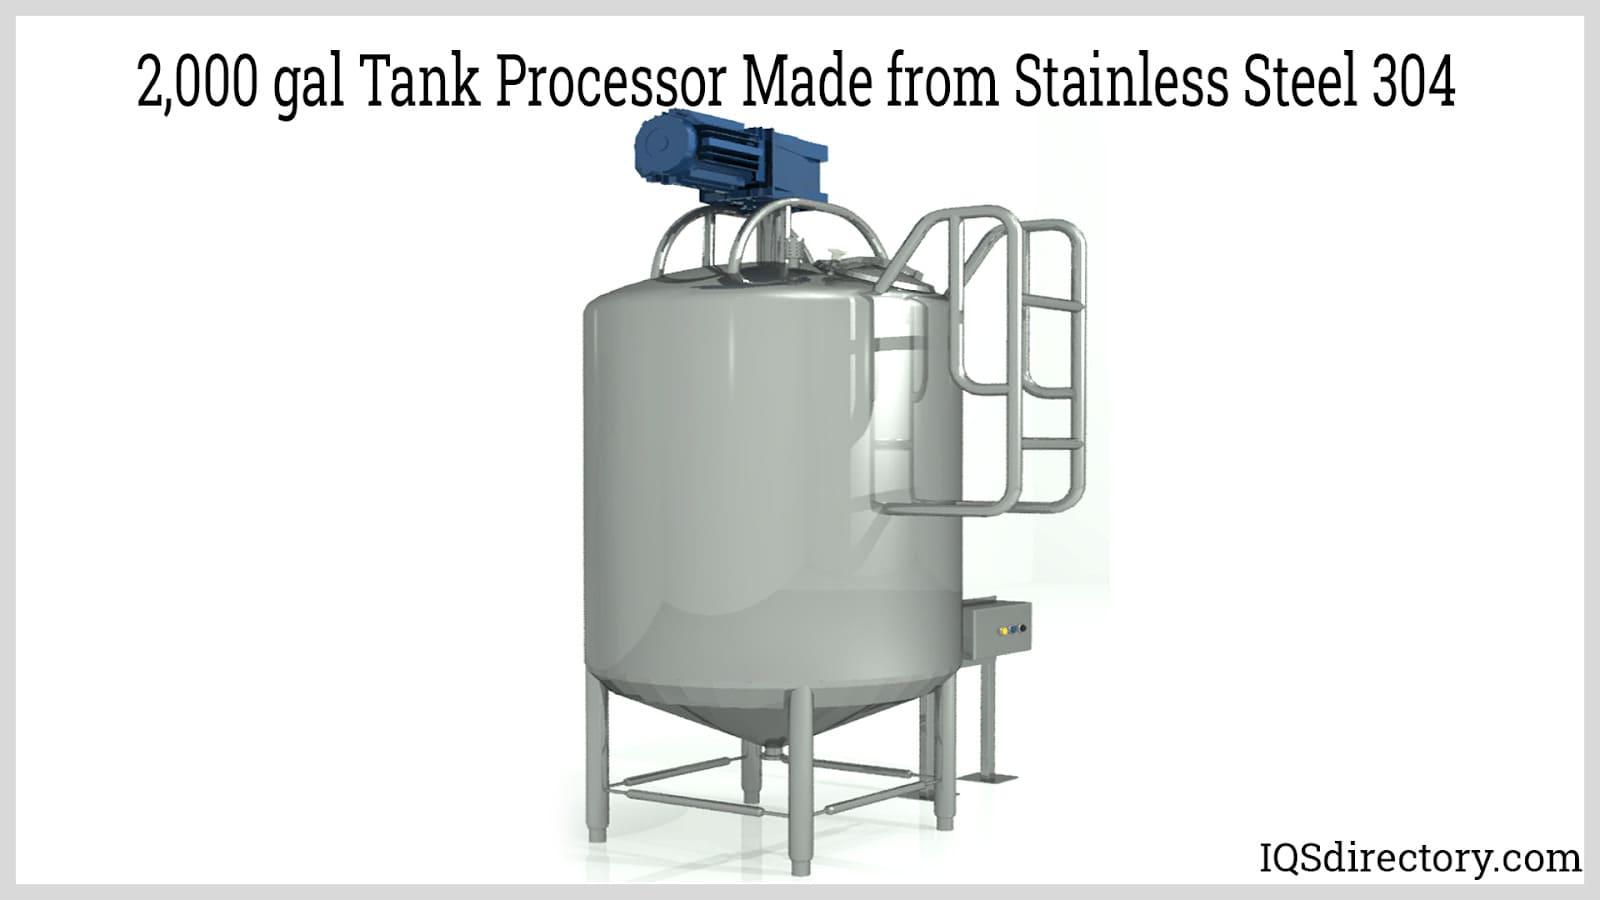 2,000 gal Tank Processor Made